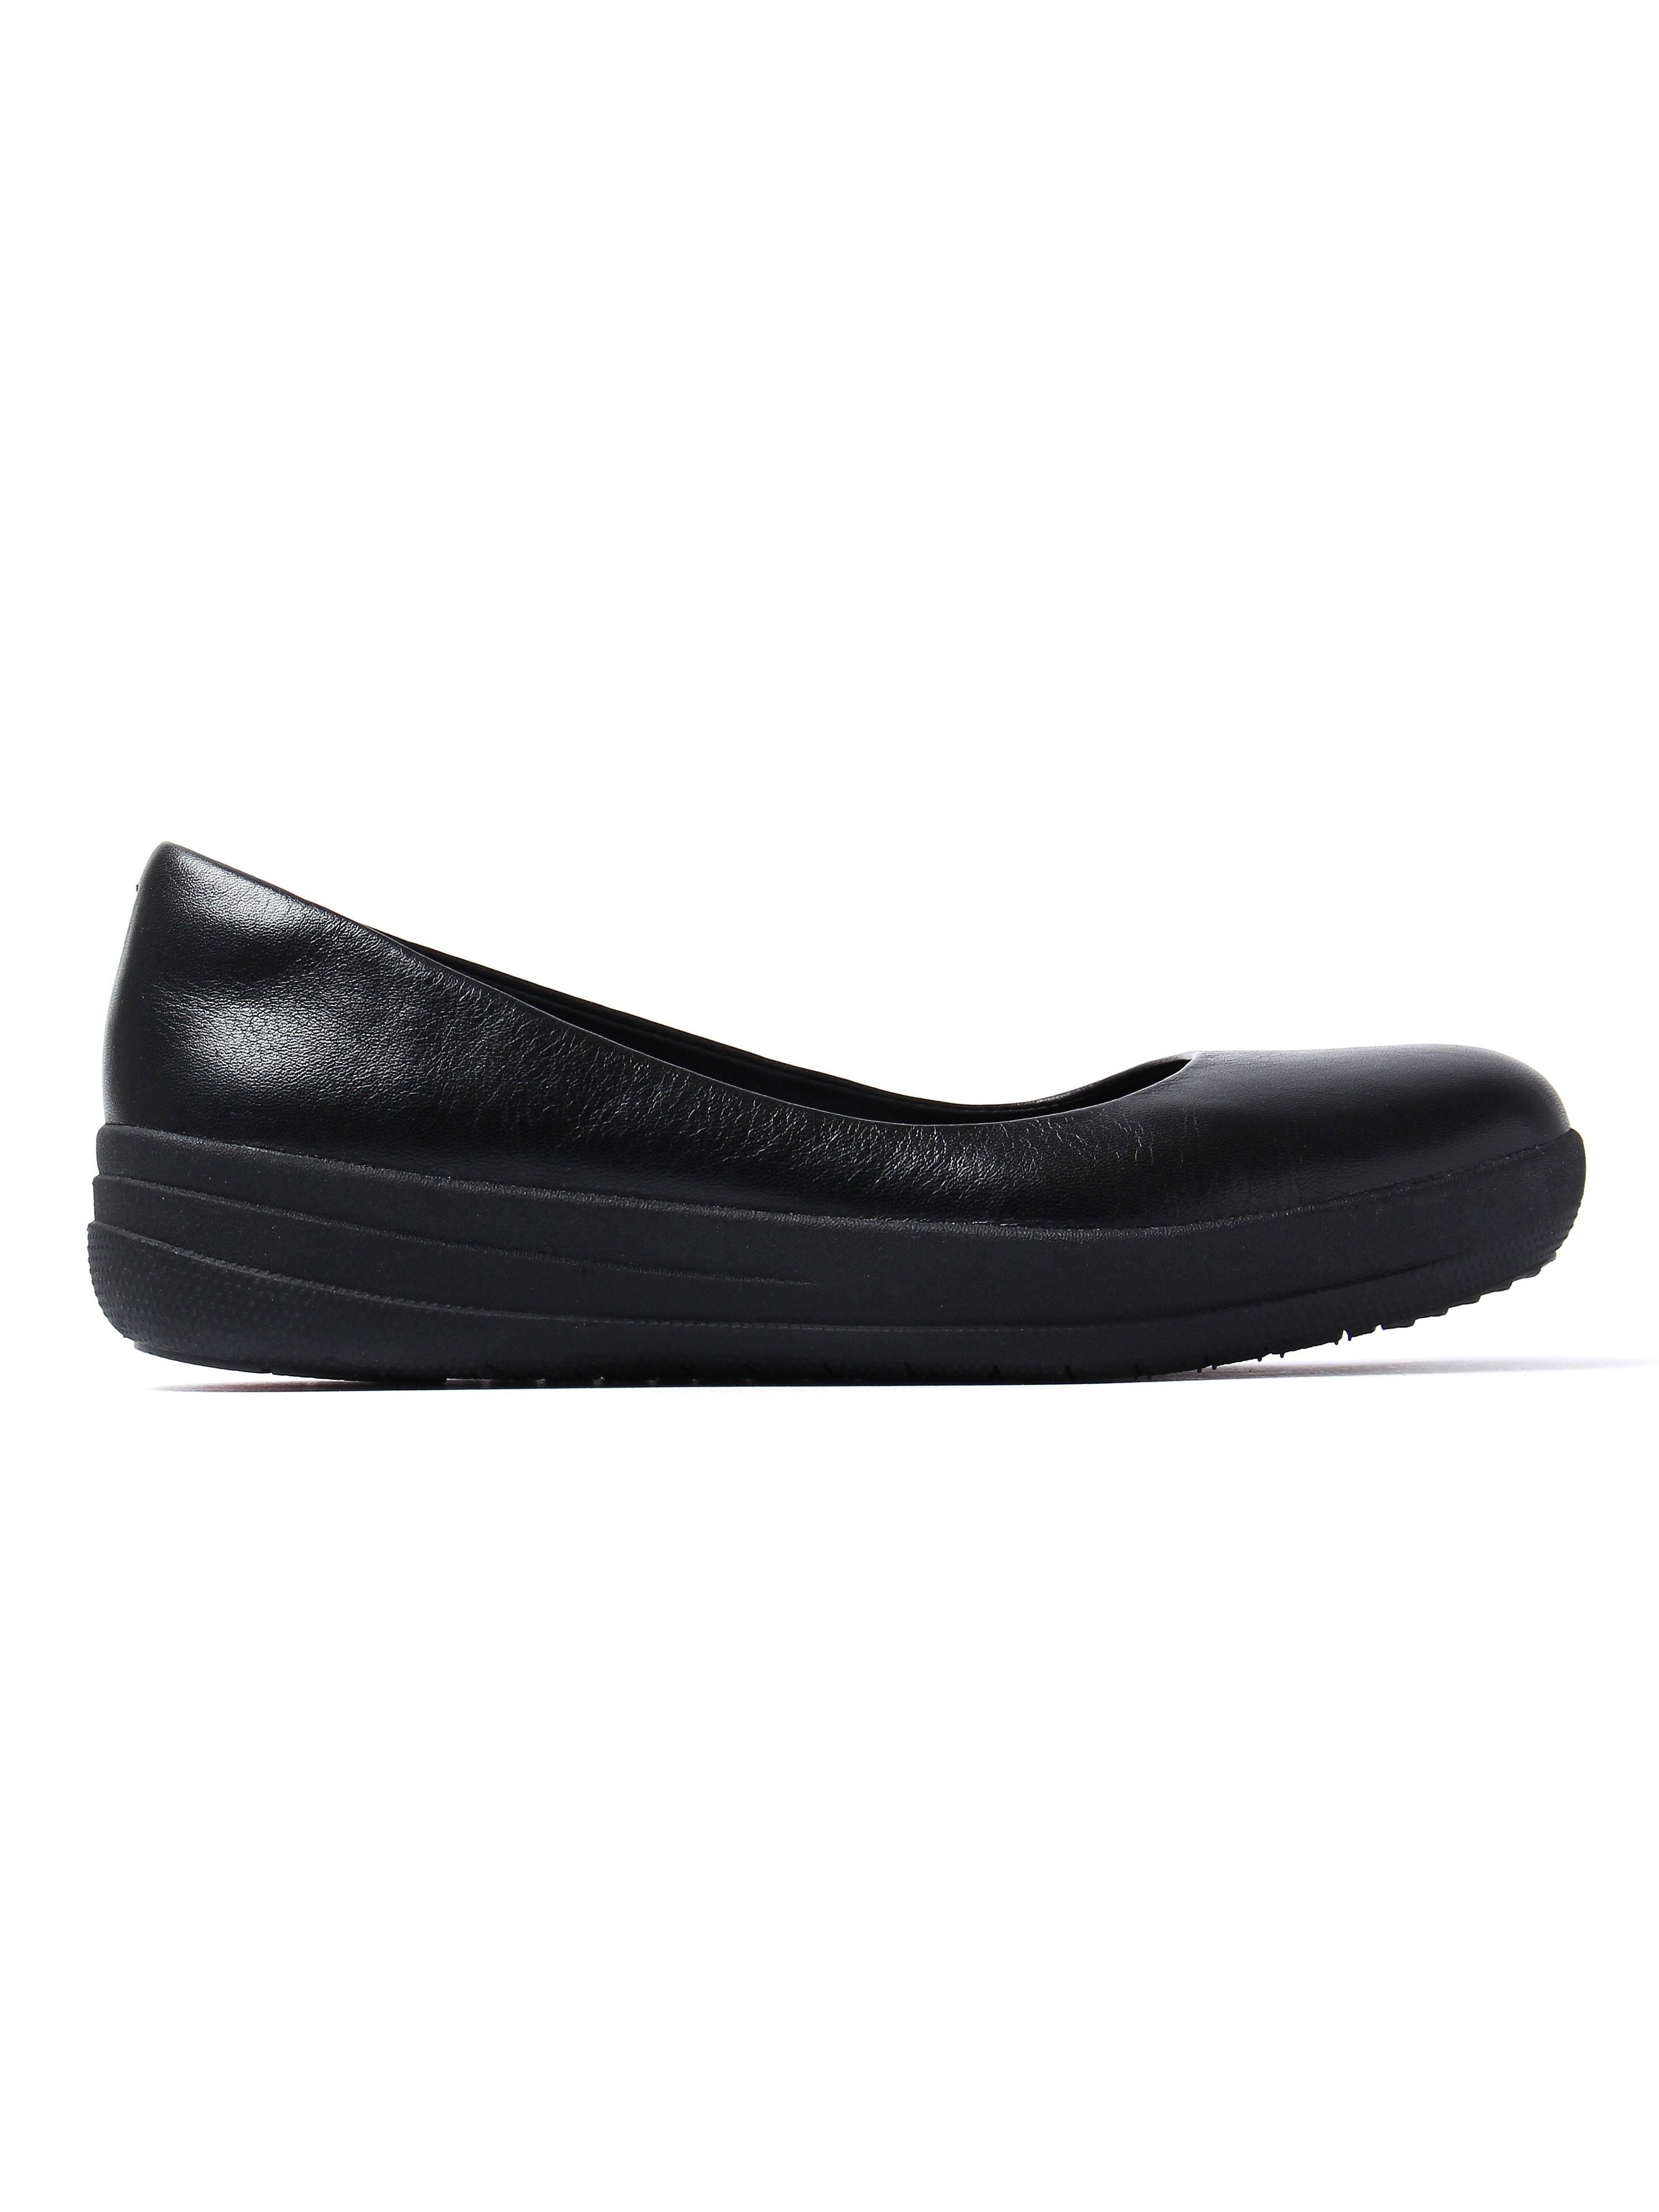 FitFlop Women's Adoraballerina Ballerina Shoes - All Black Leather